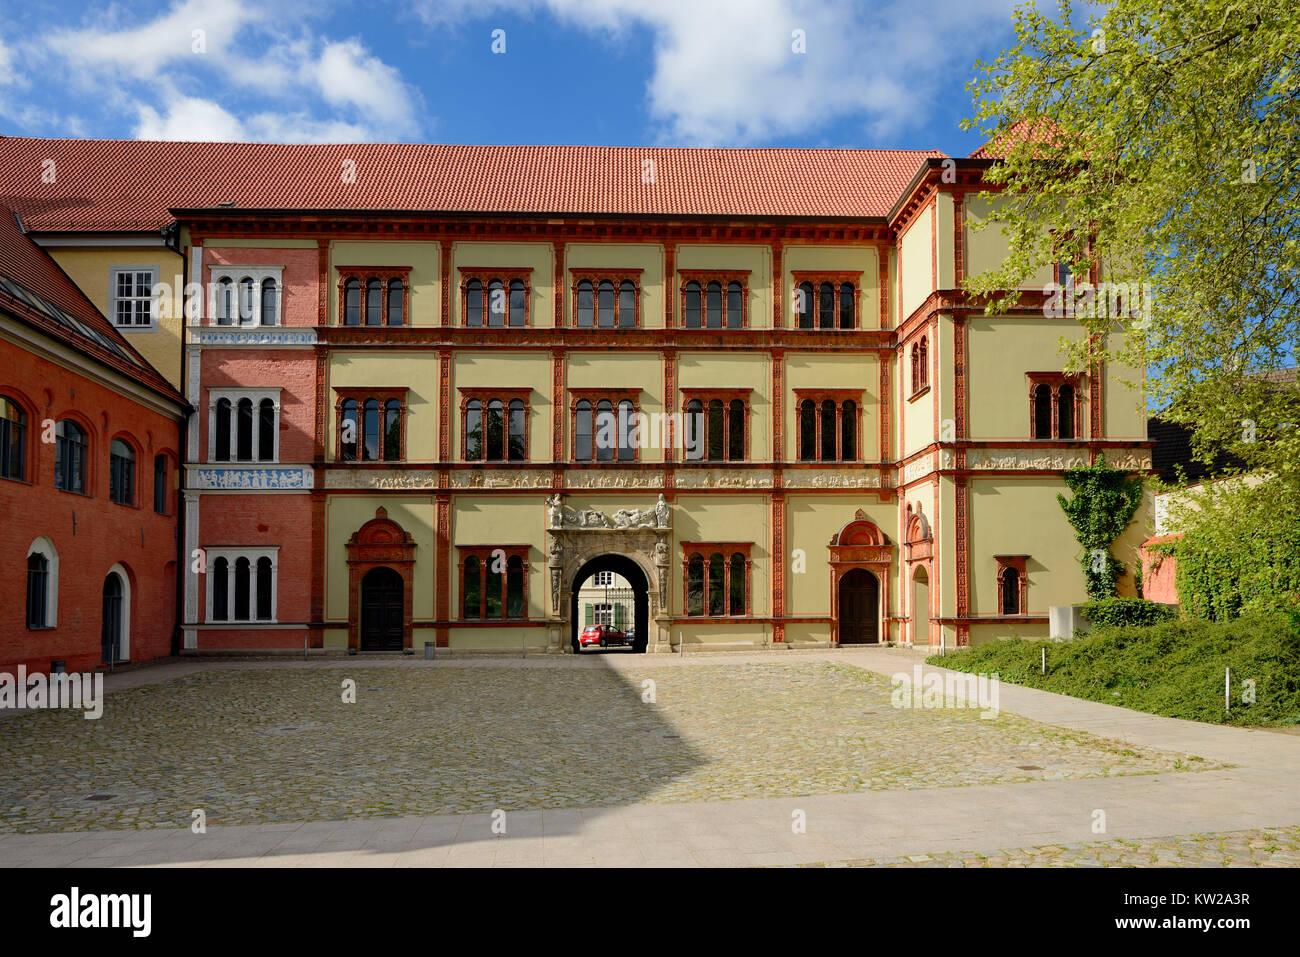 Wismar, Renaissance construction prince's court now district court, Renaissancebau Fürstenhof jetzt Amtsgericht - Stock Image